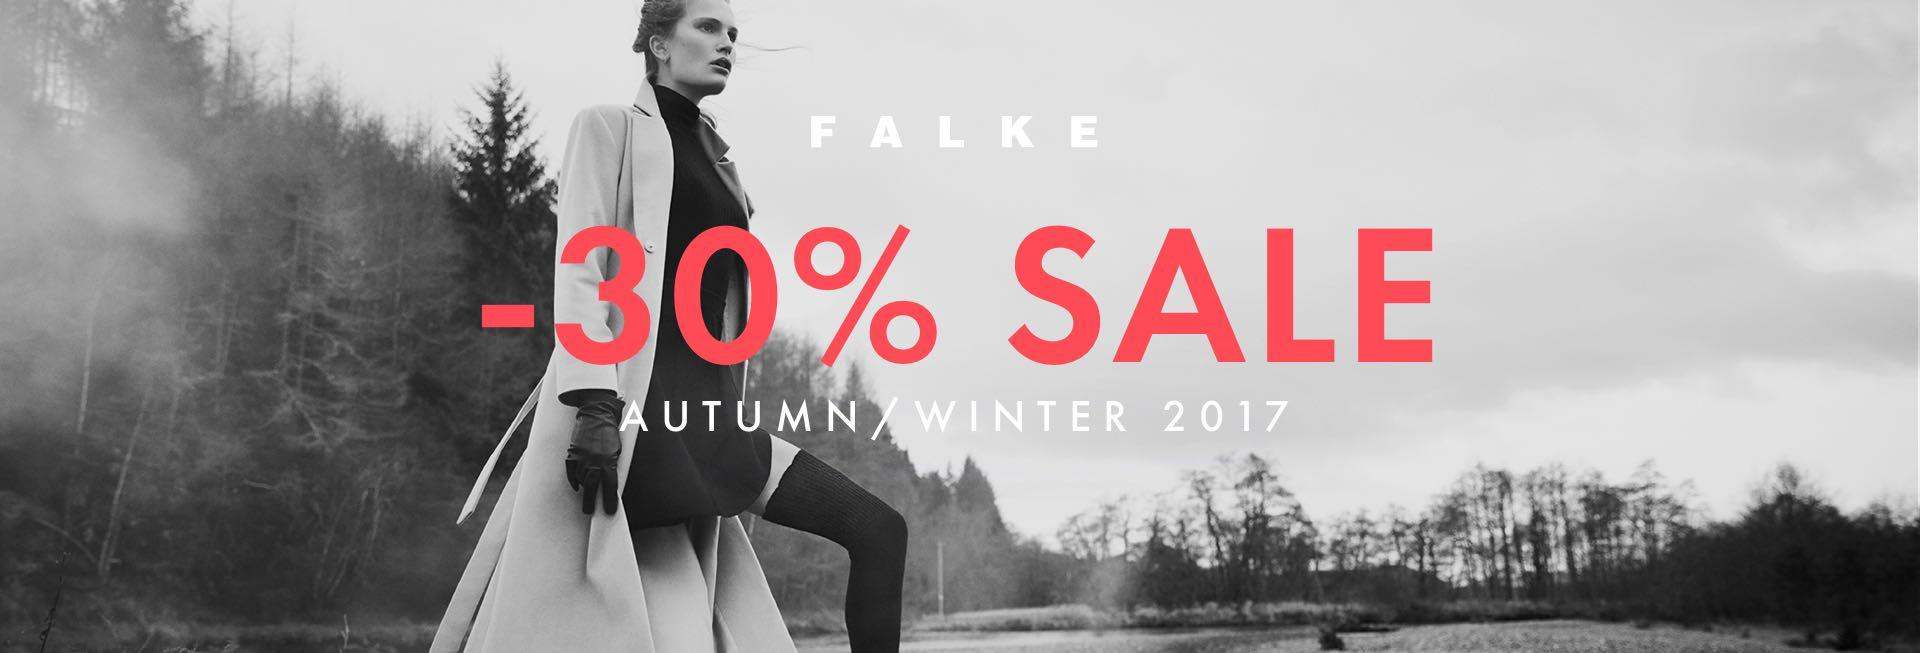 Falke: Sale 30% off autumn/winter collection